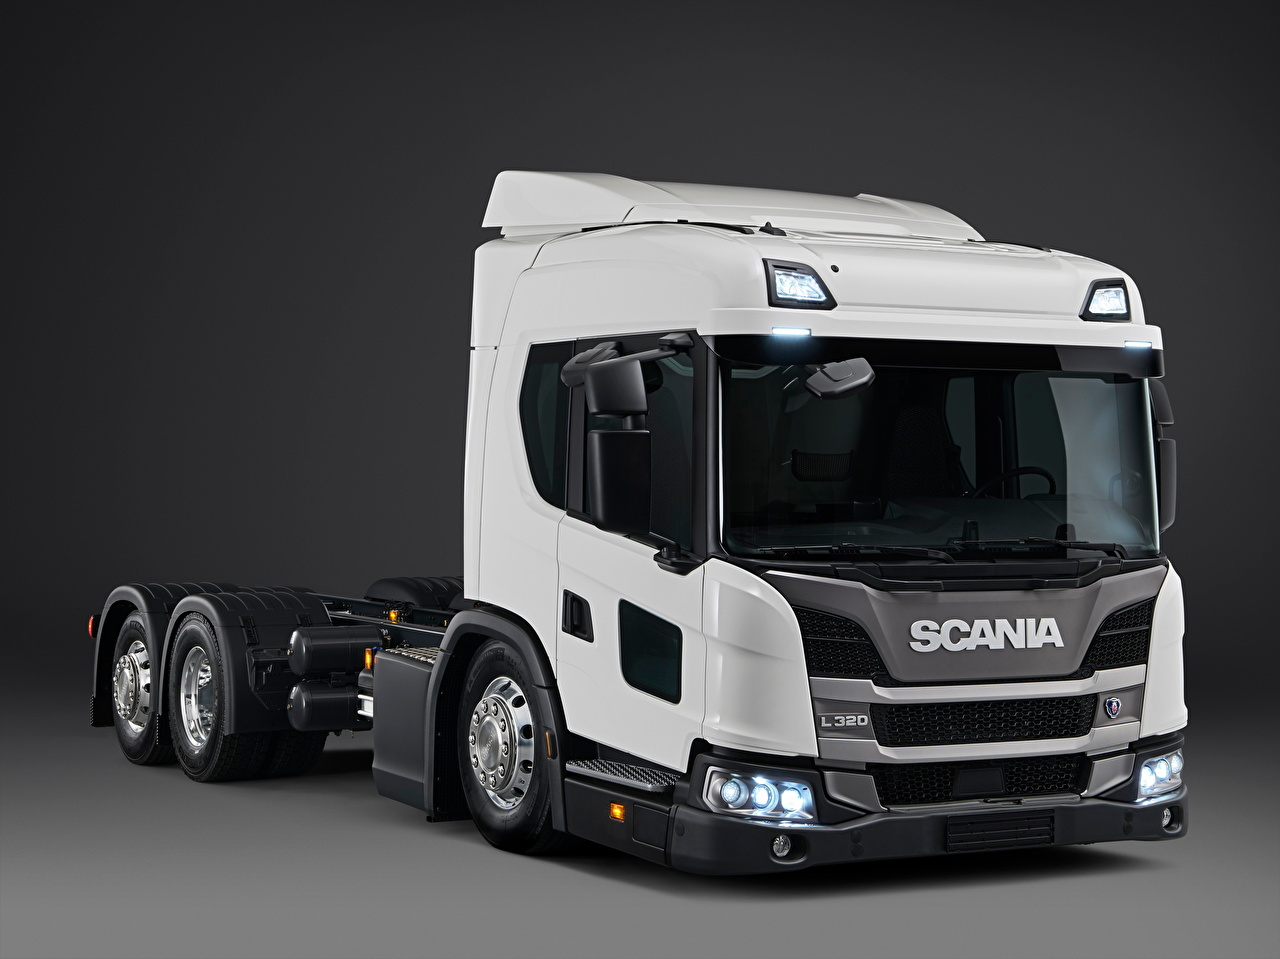 Image Scania Trucks L 320 6x2 '2018 White Cars lorry auto automobile